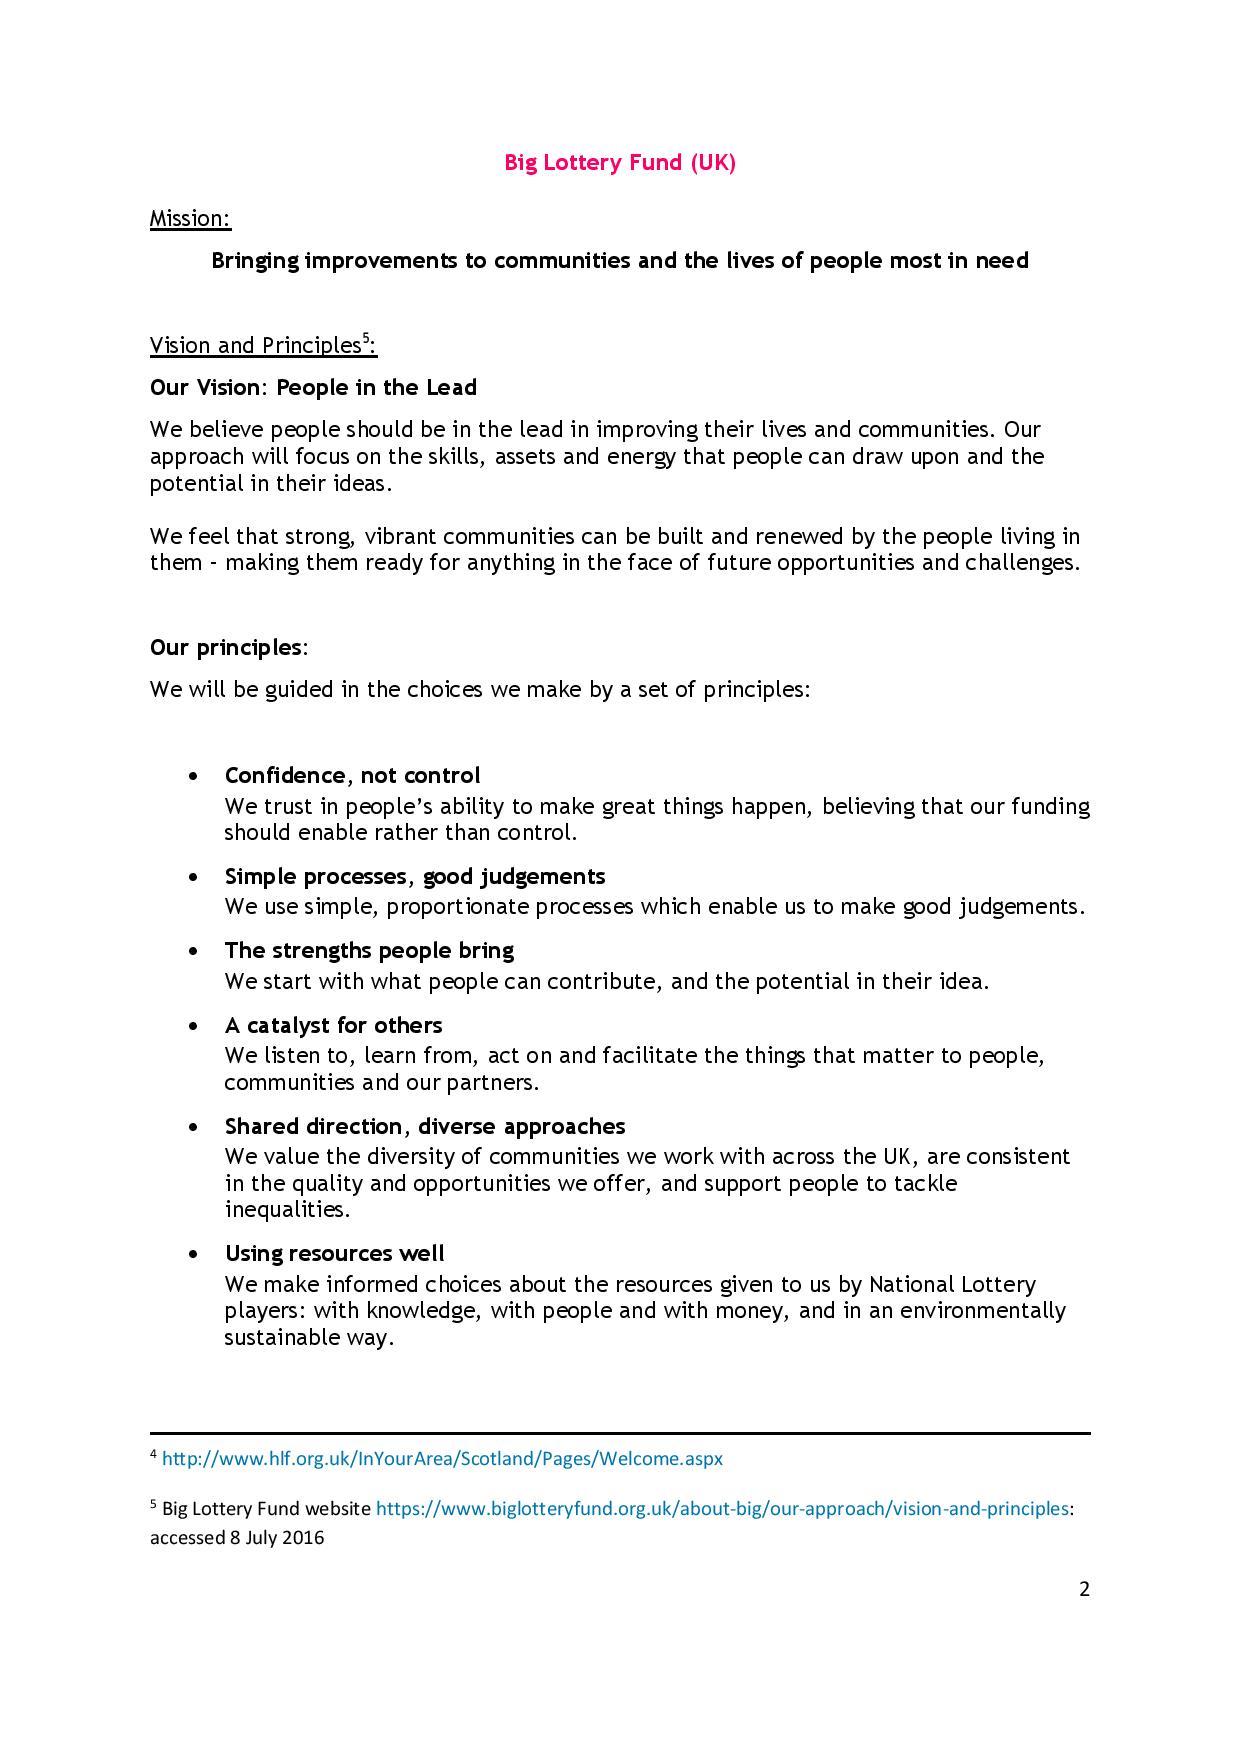 Big_Lottery_Fund_Scotland_Information_Briefing-page-002.jpg